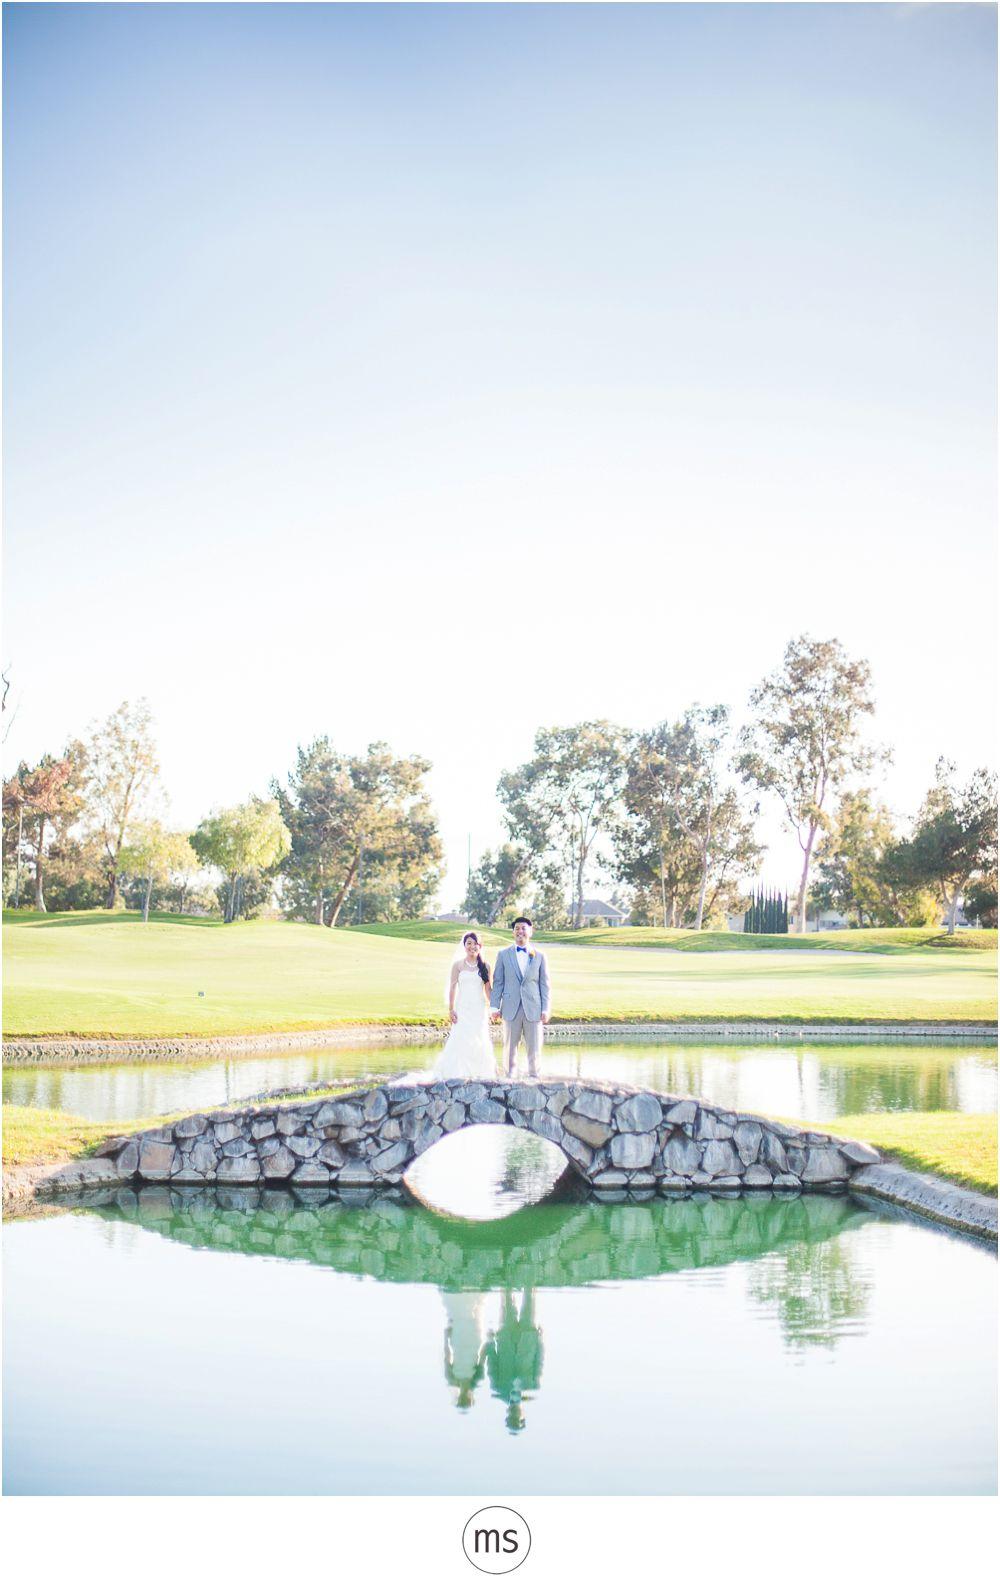 Charles & Sarah Alta Vista Country Club Placentia Wedding - Margarette Sia Photography_0078